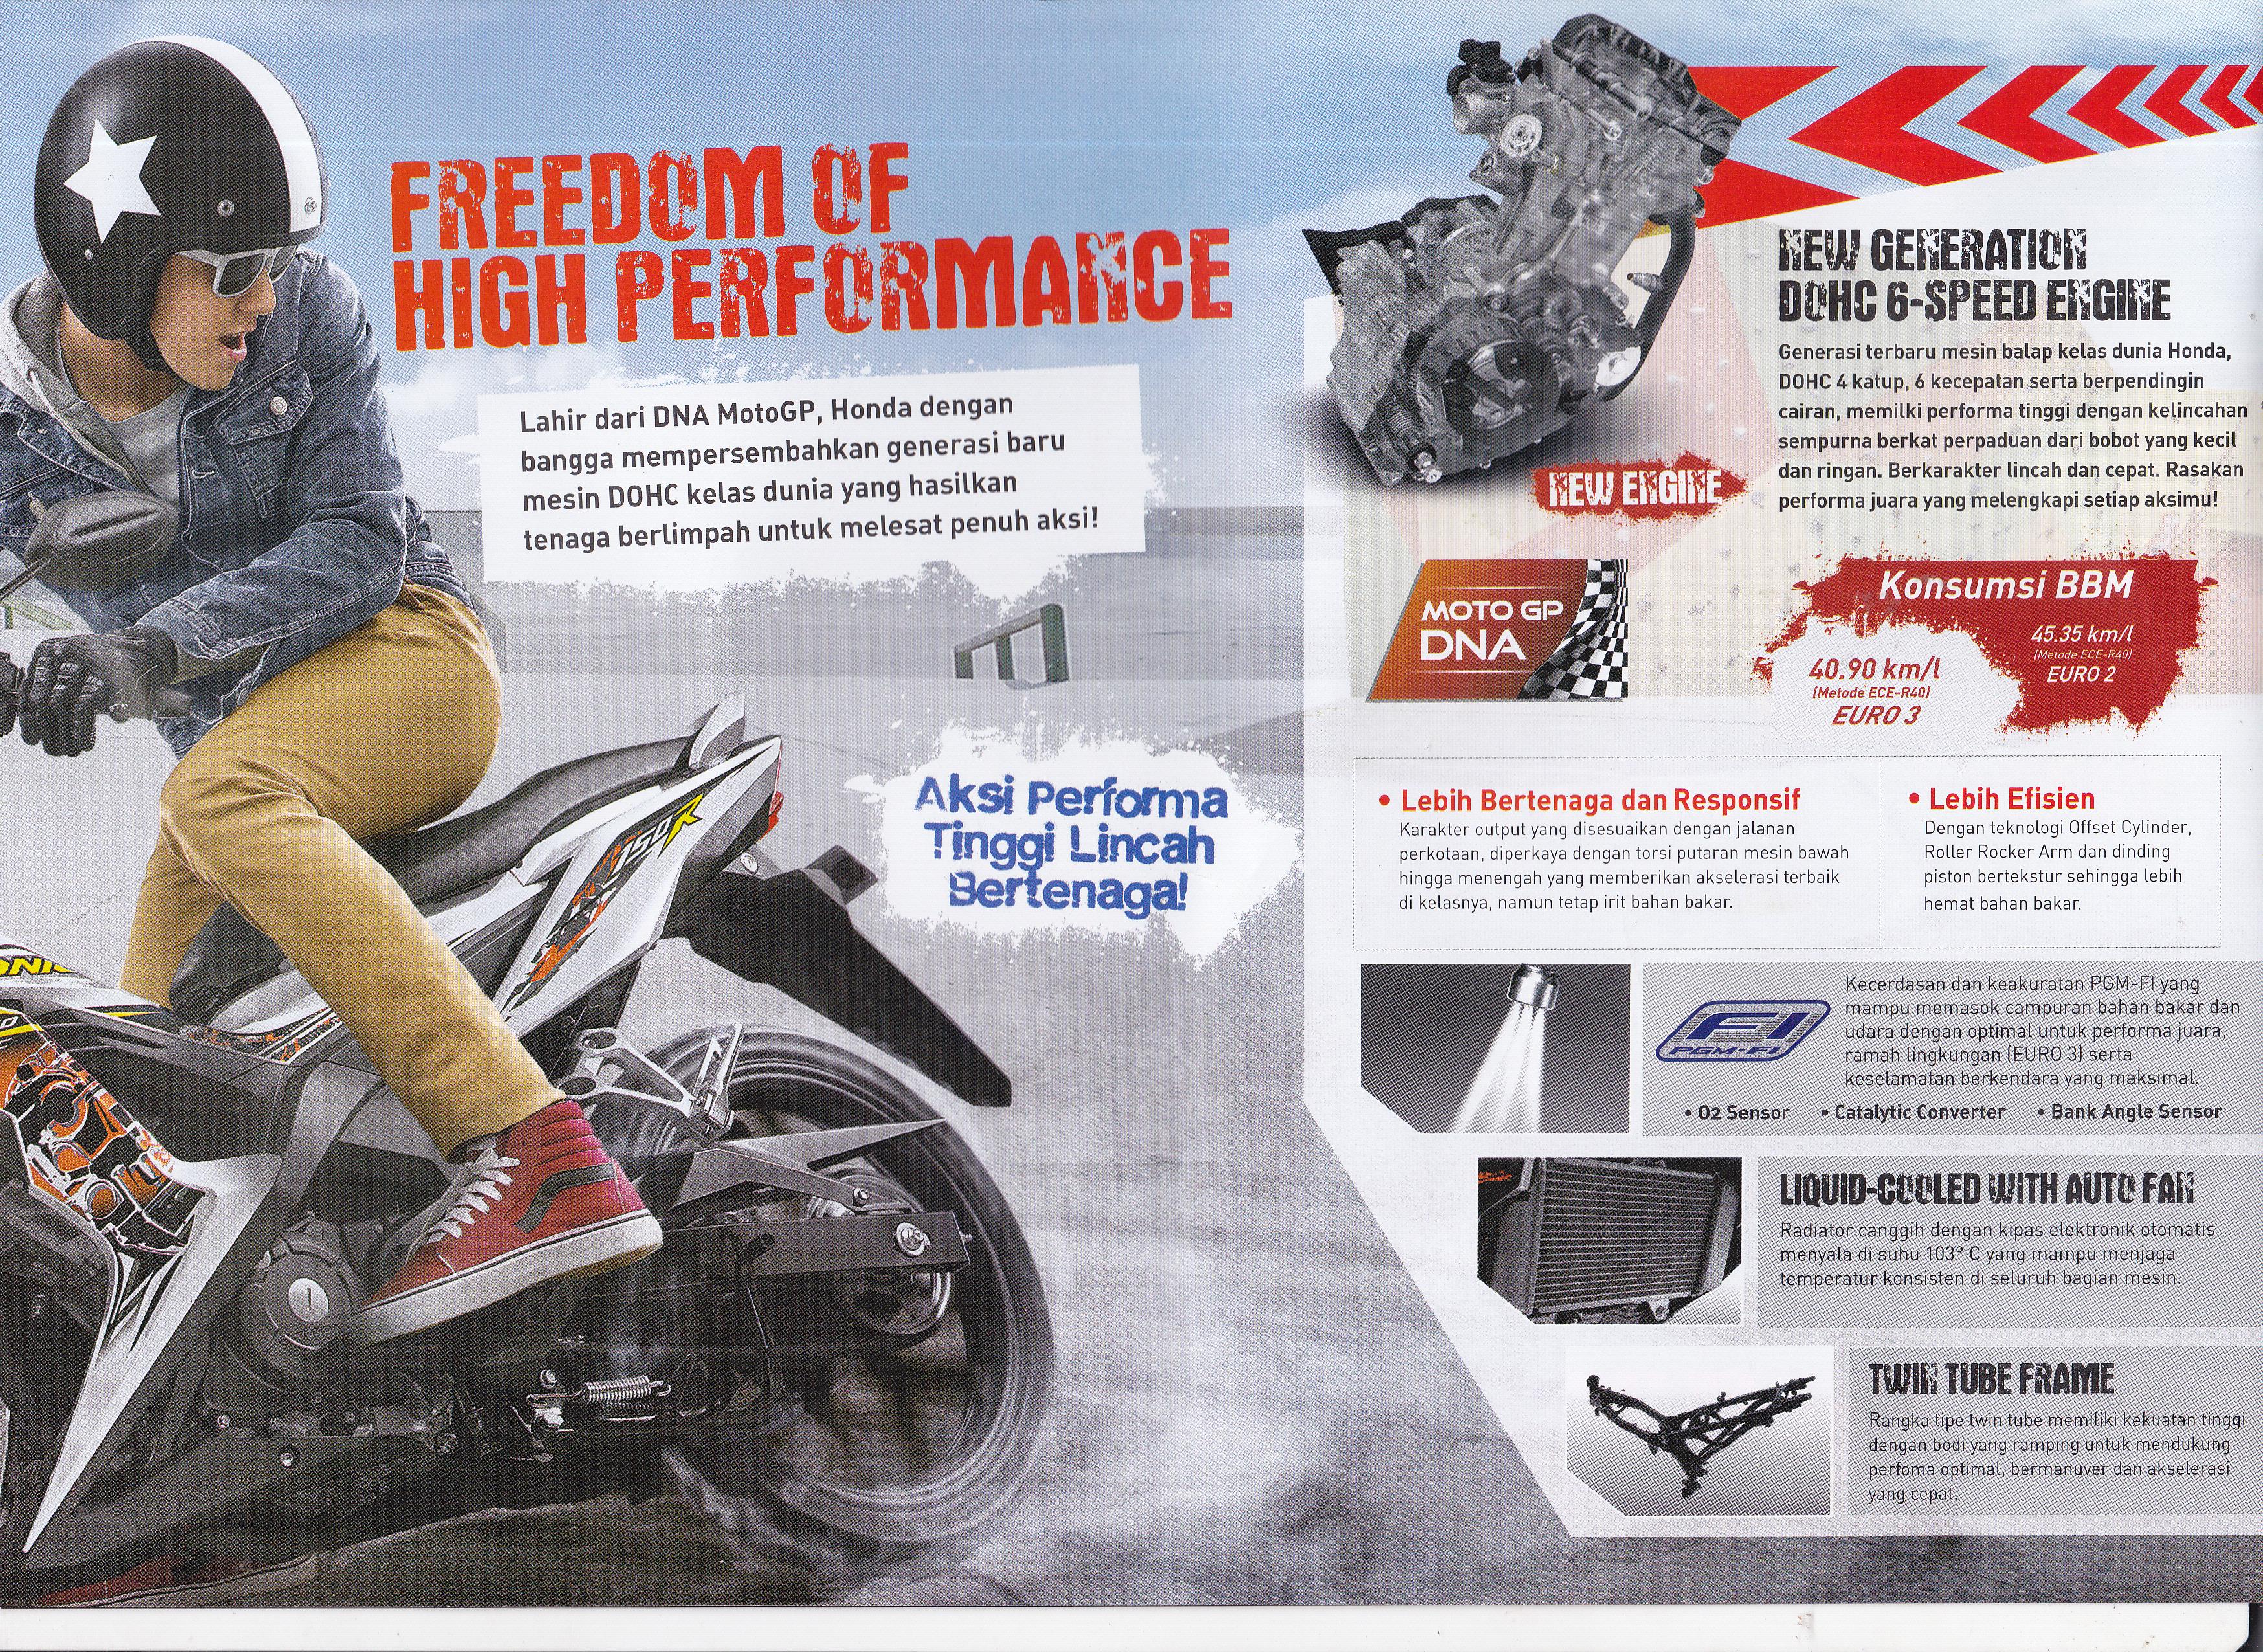 Sepeda Motor Page 113 New Vario 110 Esp Cbs Estilo Black Kendal Sonic5